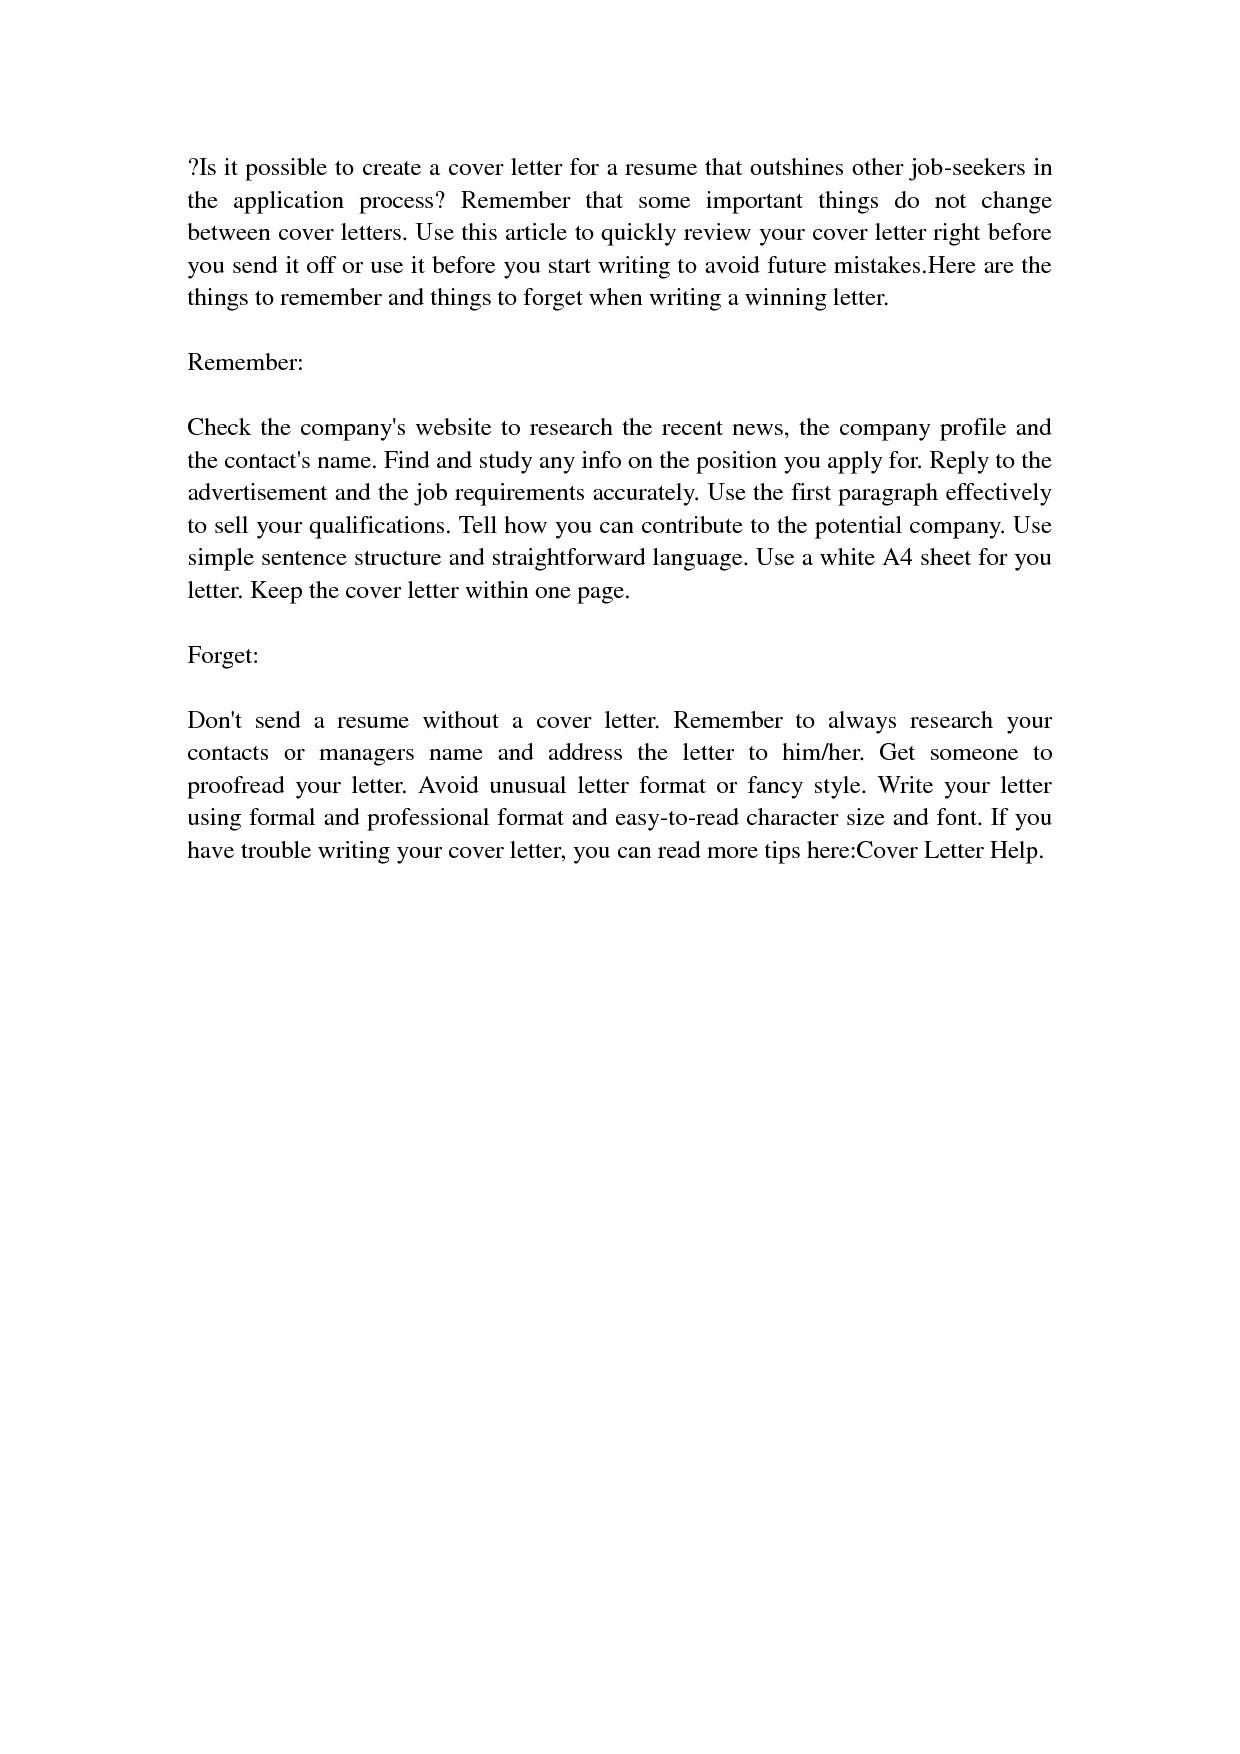 Computer Networking Cover Letter Computer Technician Cover Letter Granitestateartsmarket Com